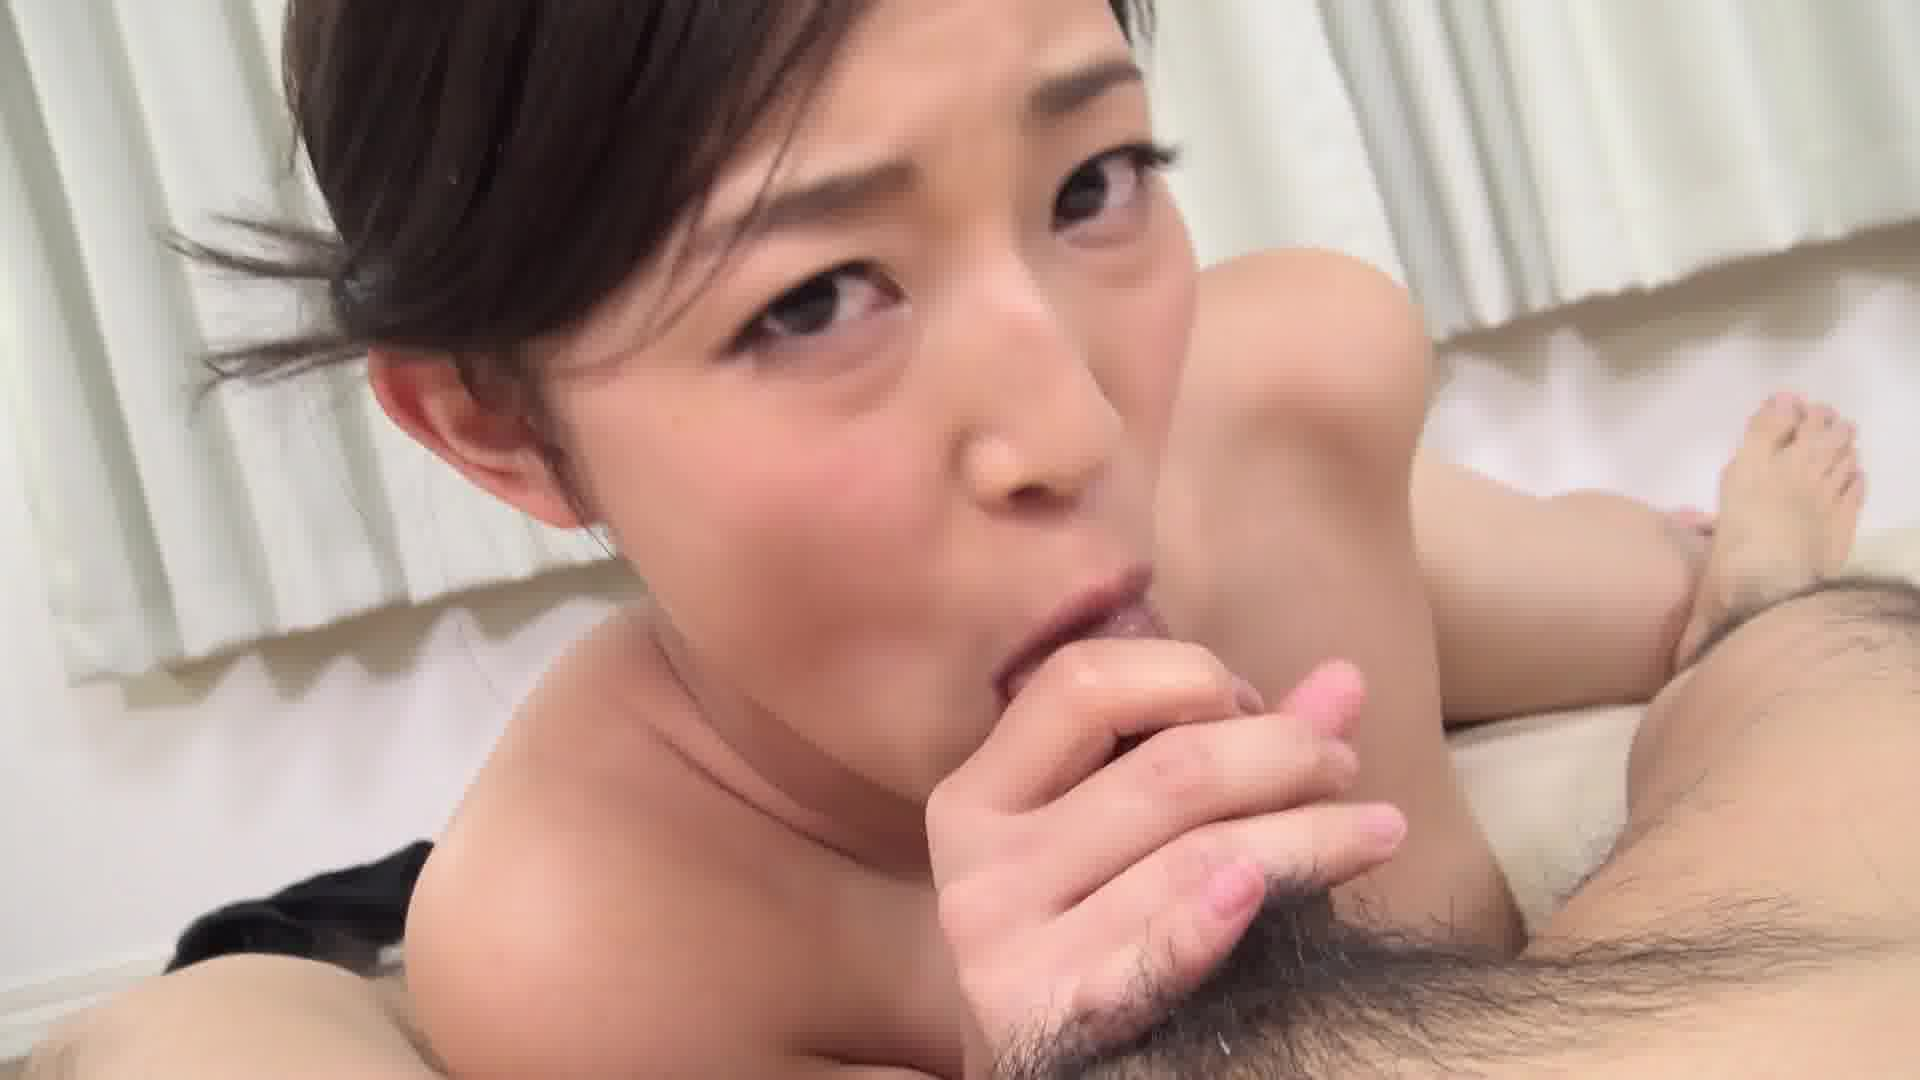 THE 未公開 ~敏感マゾ乳のすごいパイズリ6~ - 日高千晶【パイパン・パイズリ・隠語】